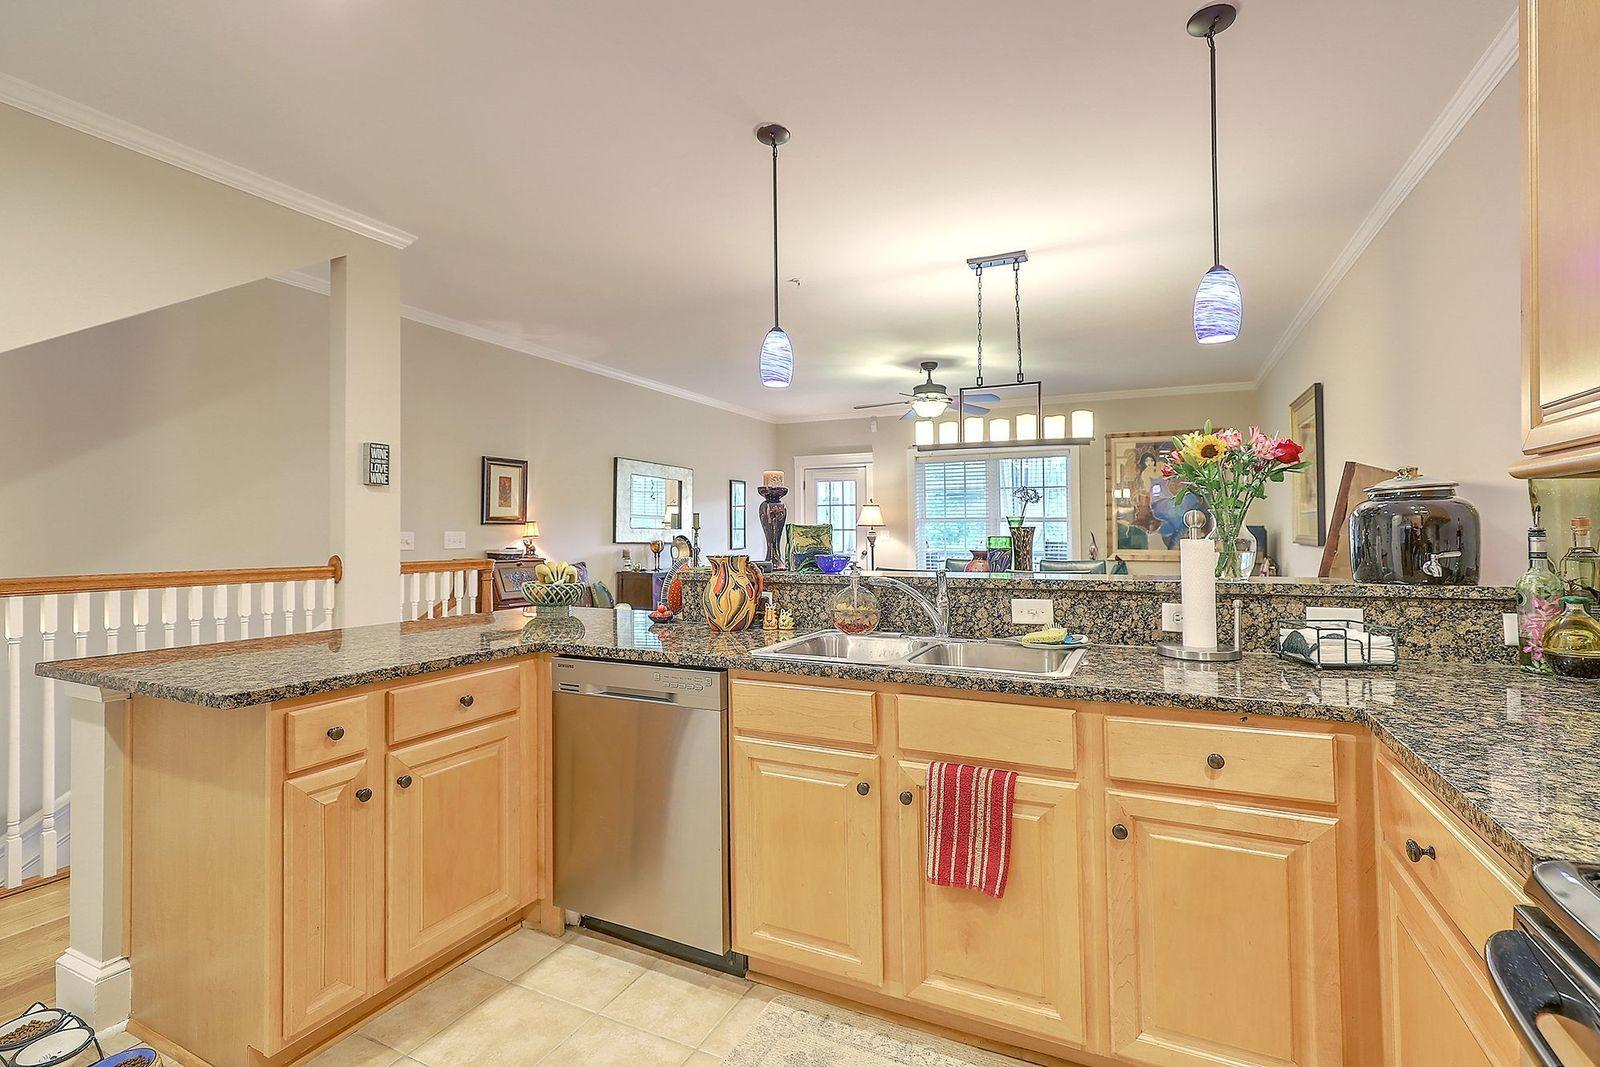 Etiwan Pointe Homes For Sale - 208 Etiwan Pointe, Mount Pleasant, SC - 31